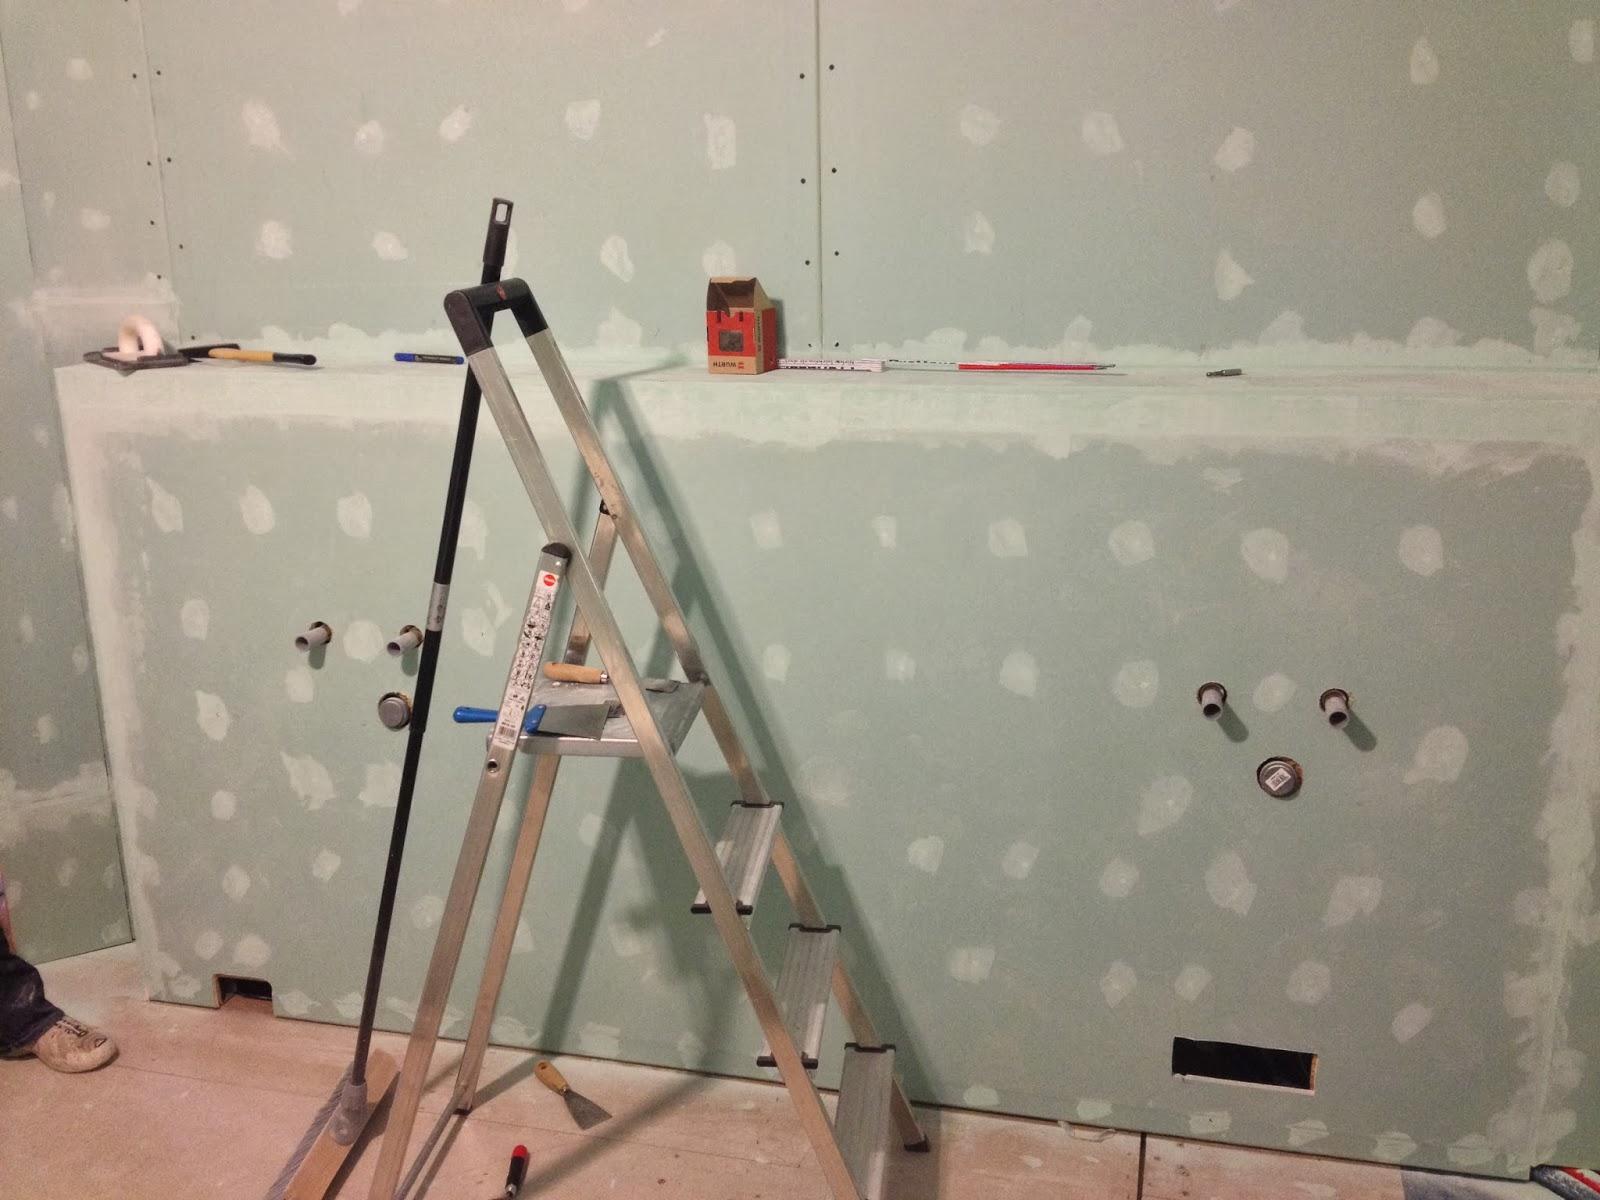 bautagebuch hassenroth februar 2014. Black Bedroom Furniture Sets. Home Design Ideas